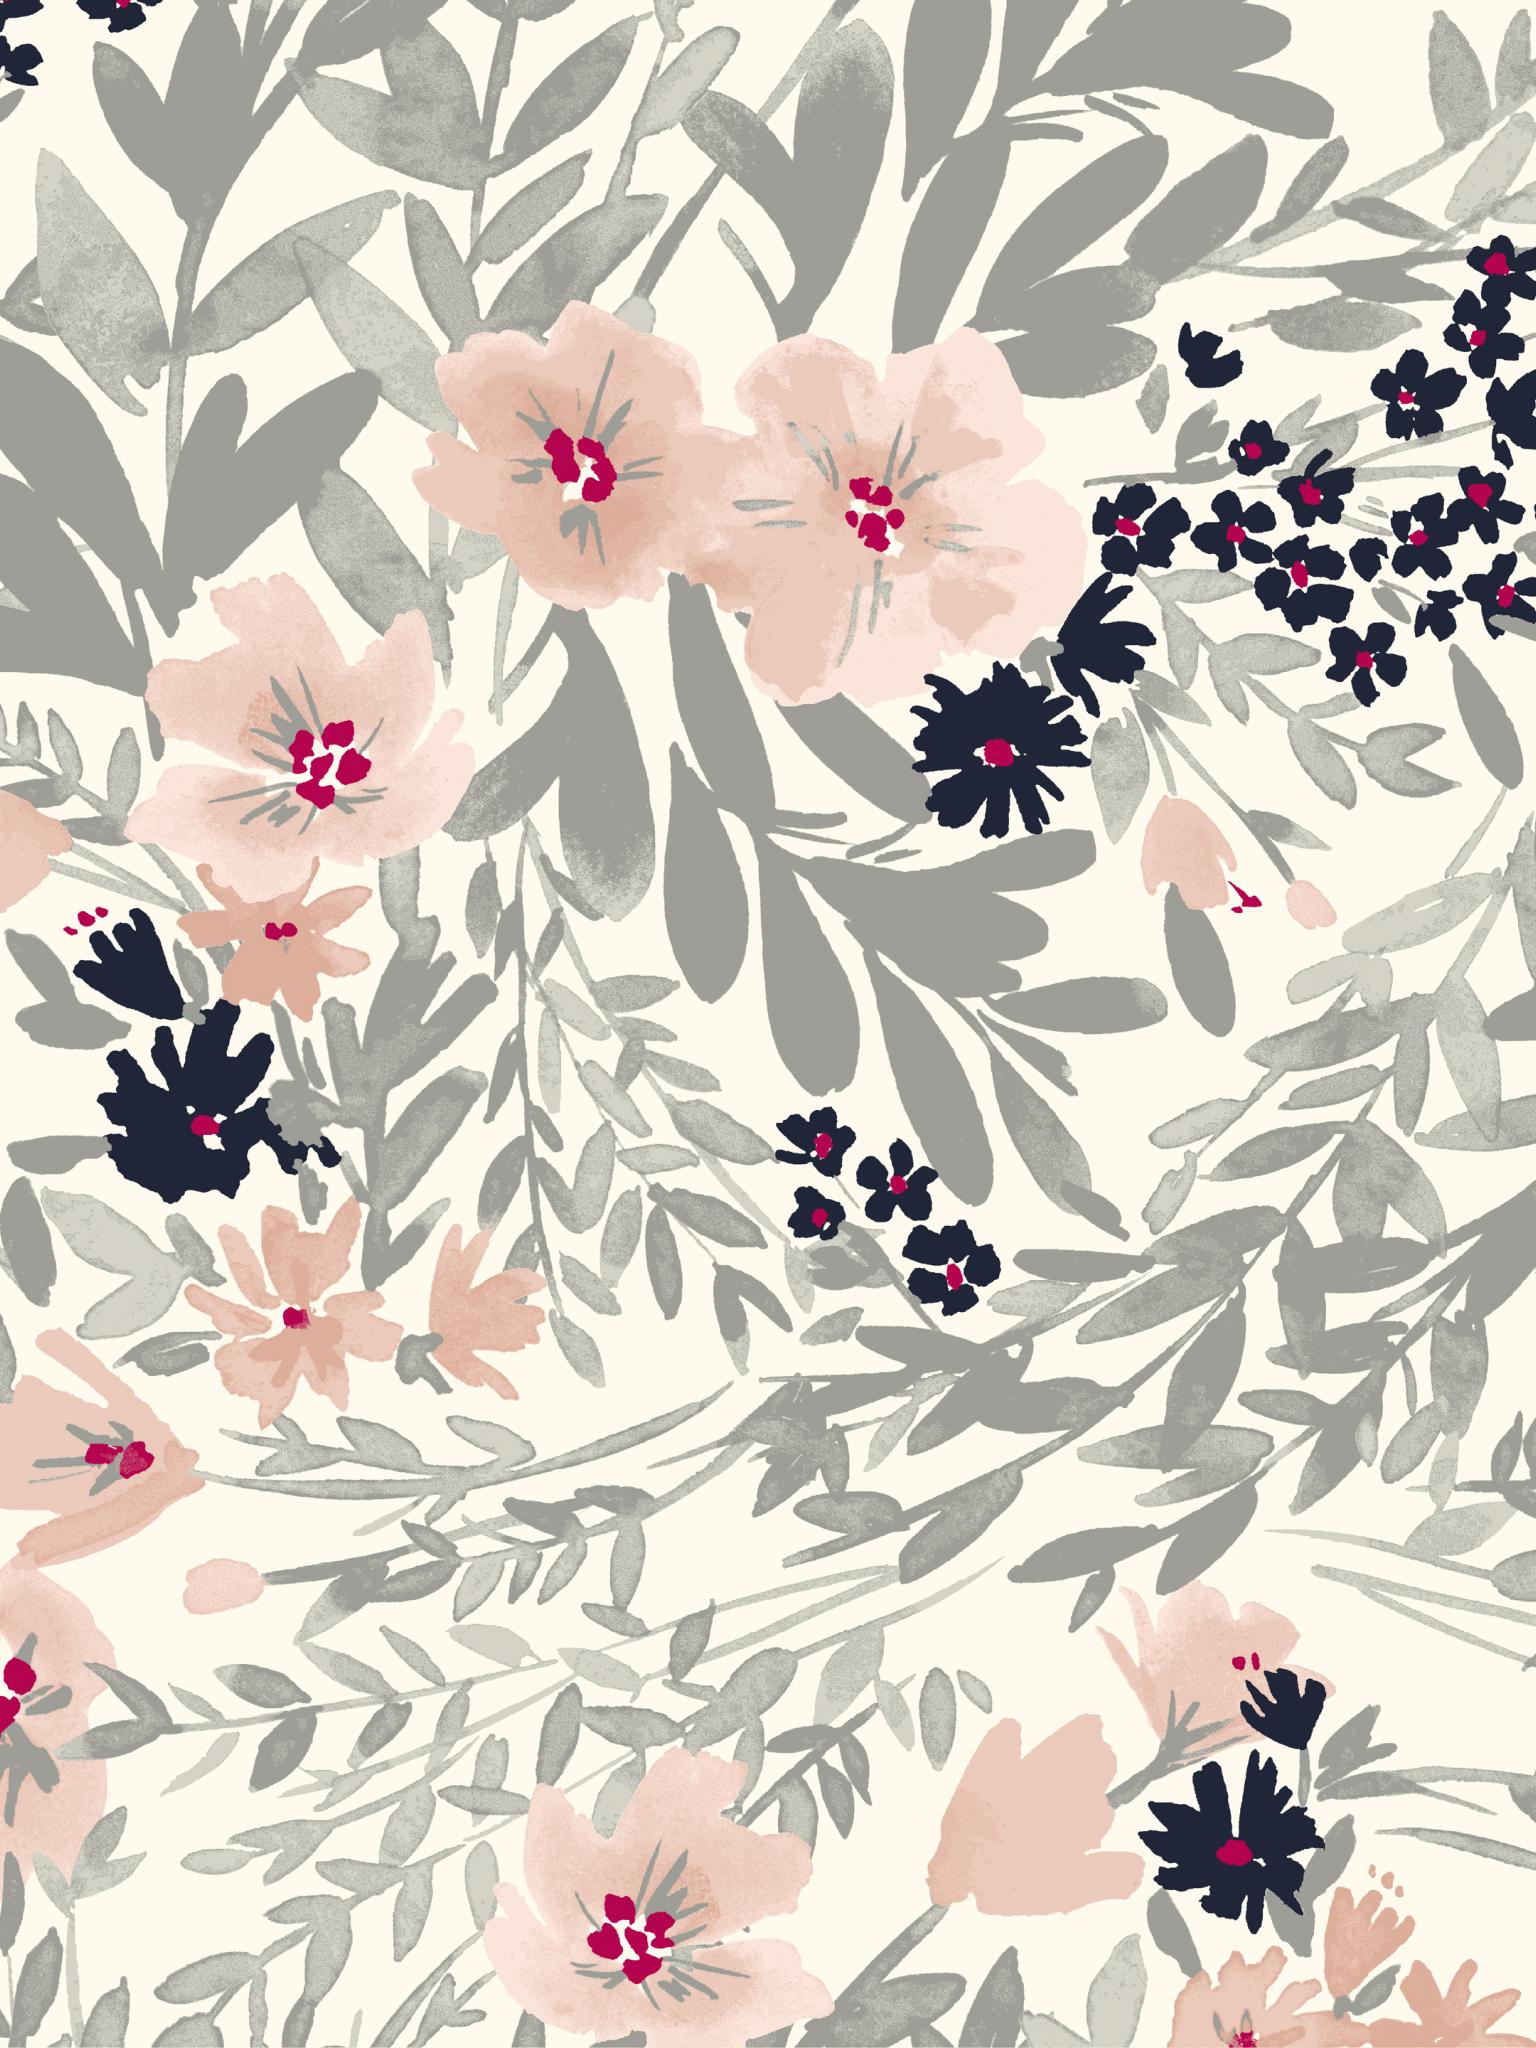 Free Download Floral Desktop Wallpaper Hd Wallpapers 5120x2880